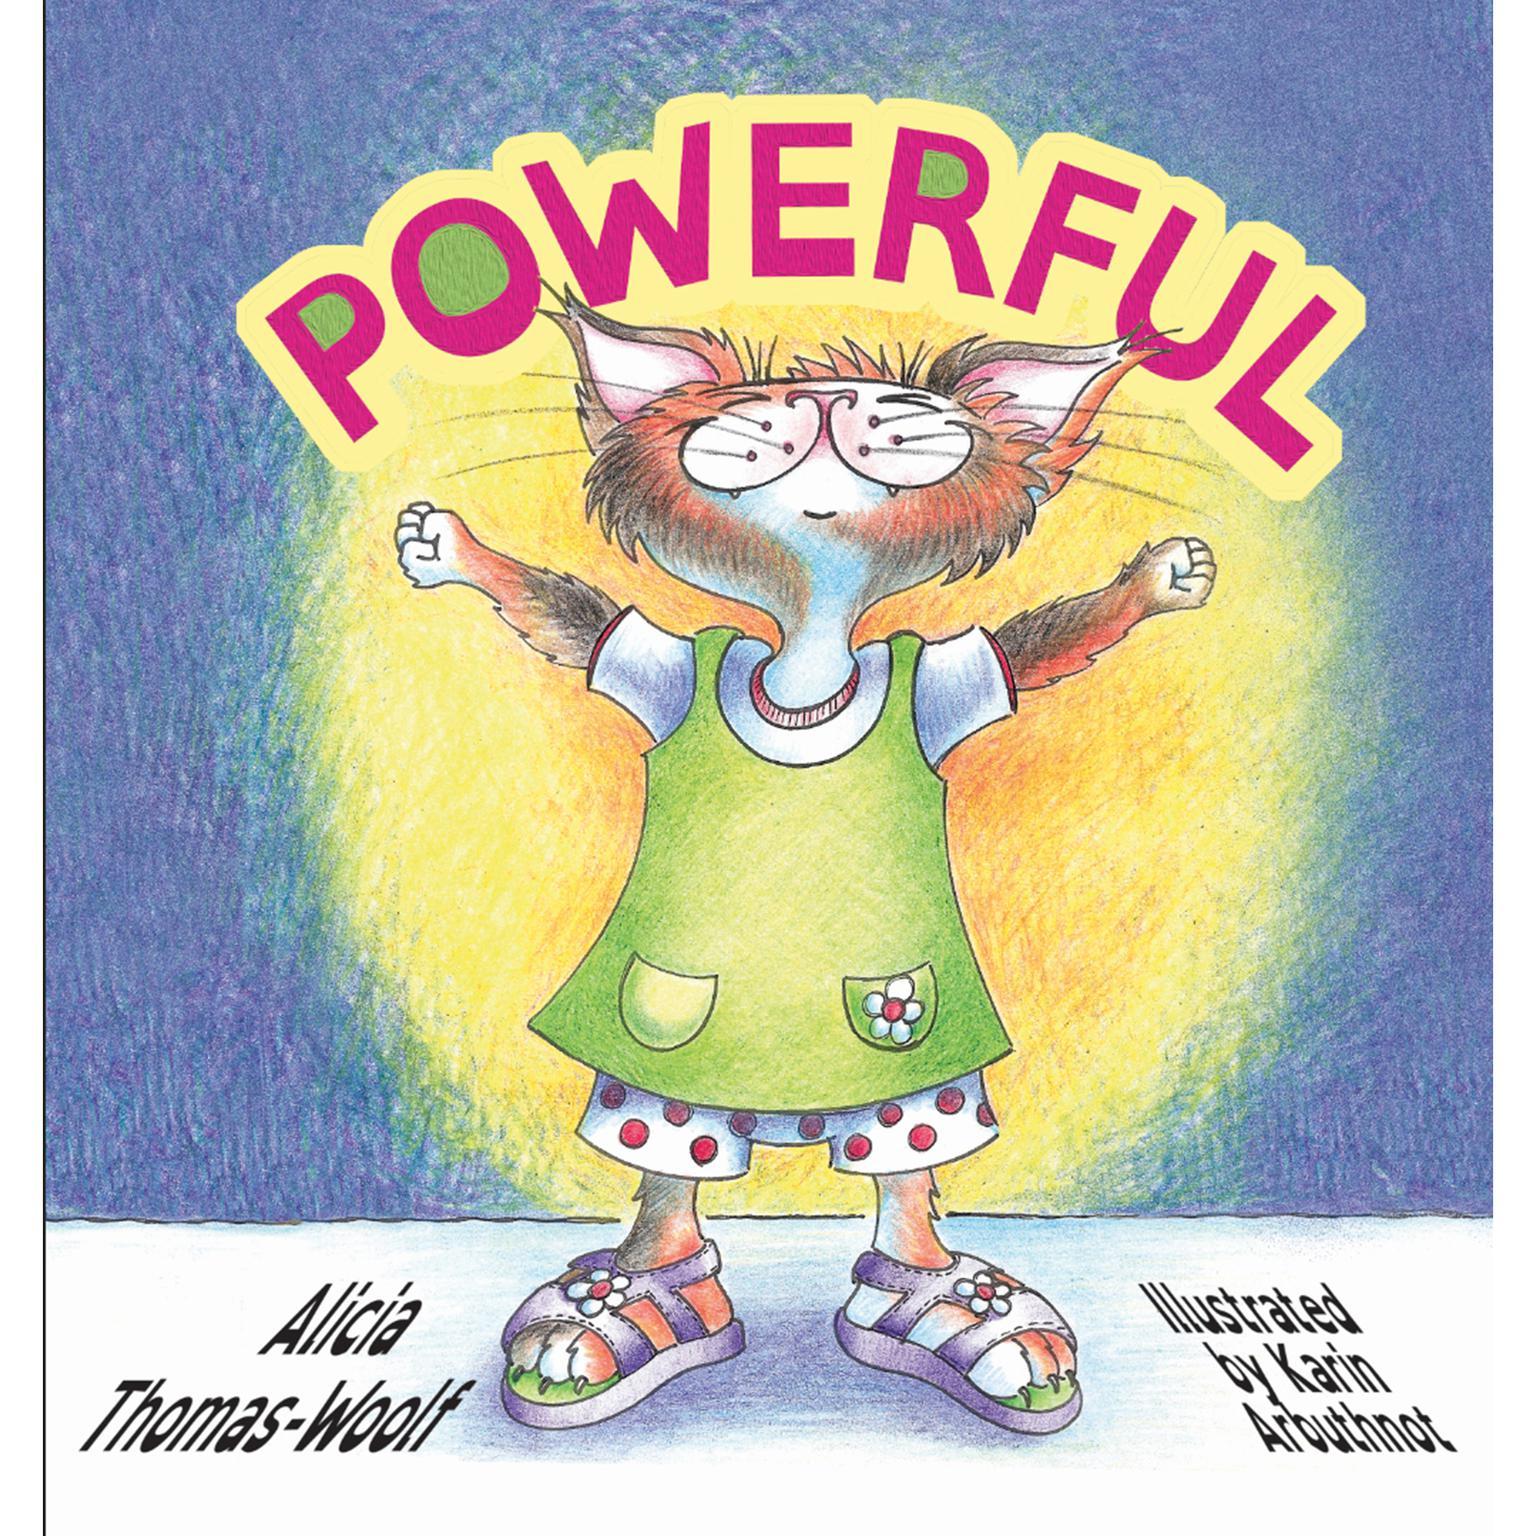 Powerful Audiobook Audiobook, by Alicia Thomas-Woolf